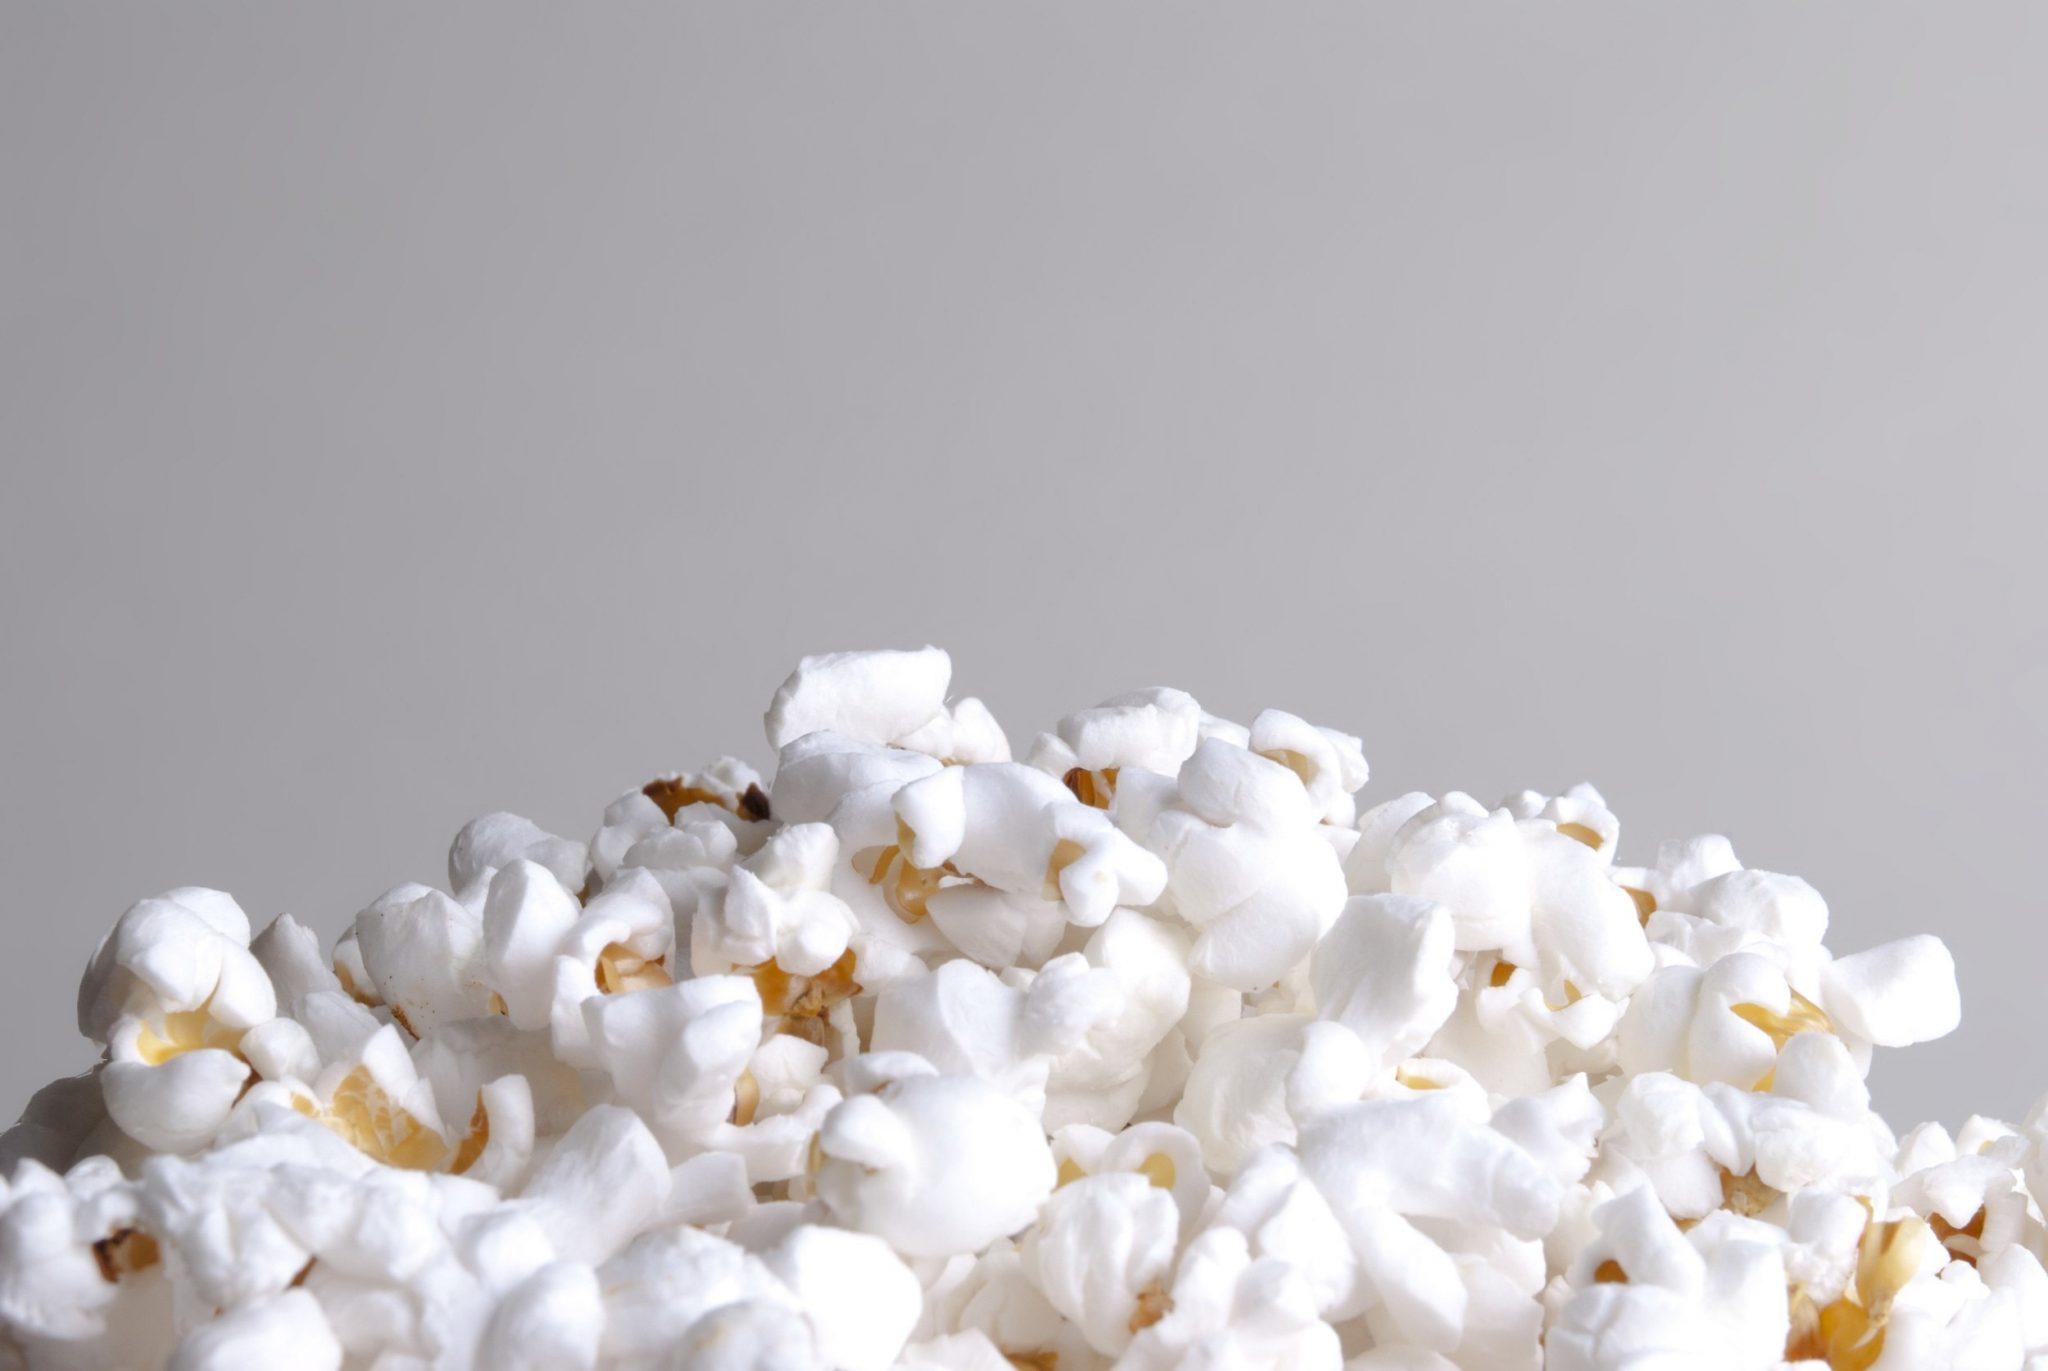 petite-maize-popcorn-hill-bottom-closup